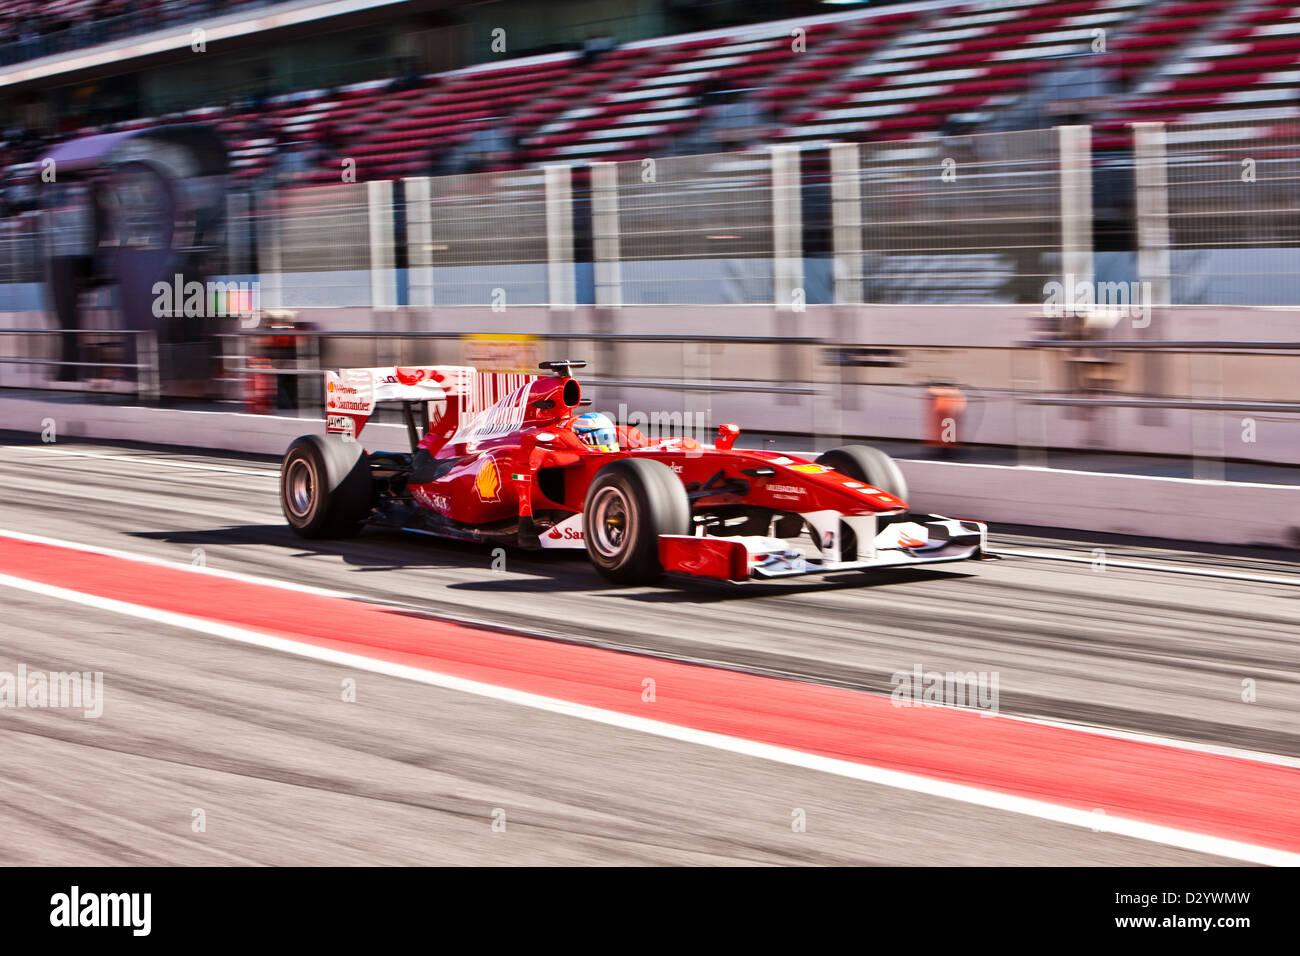 Formel 1 Auto Aktion, Barcelona, 27 02 10 Stockbild